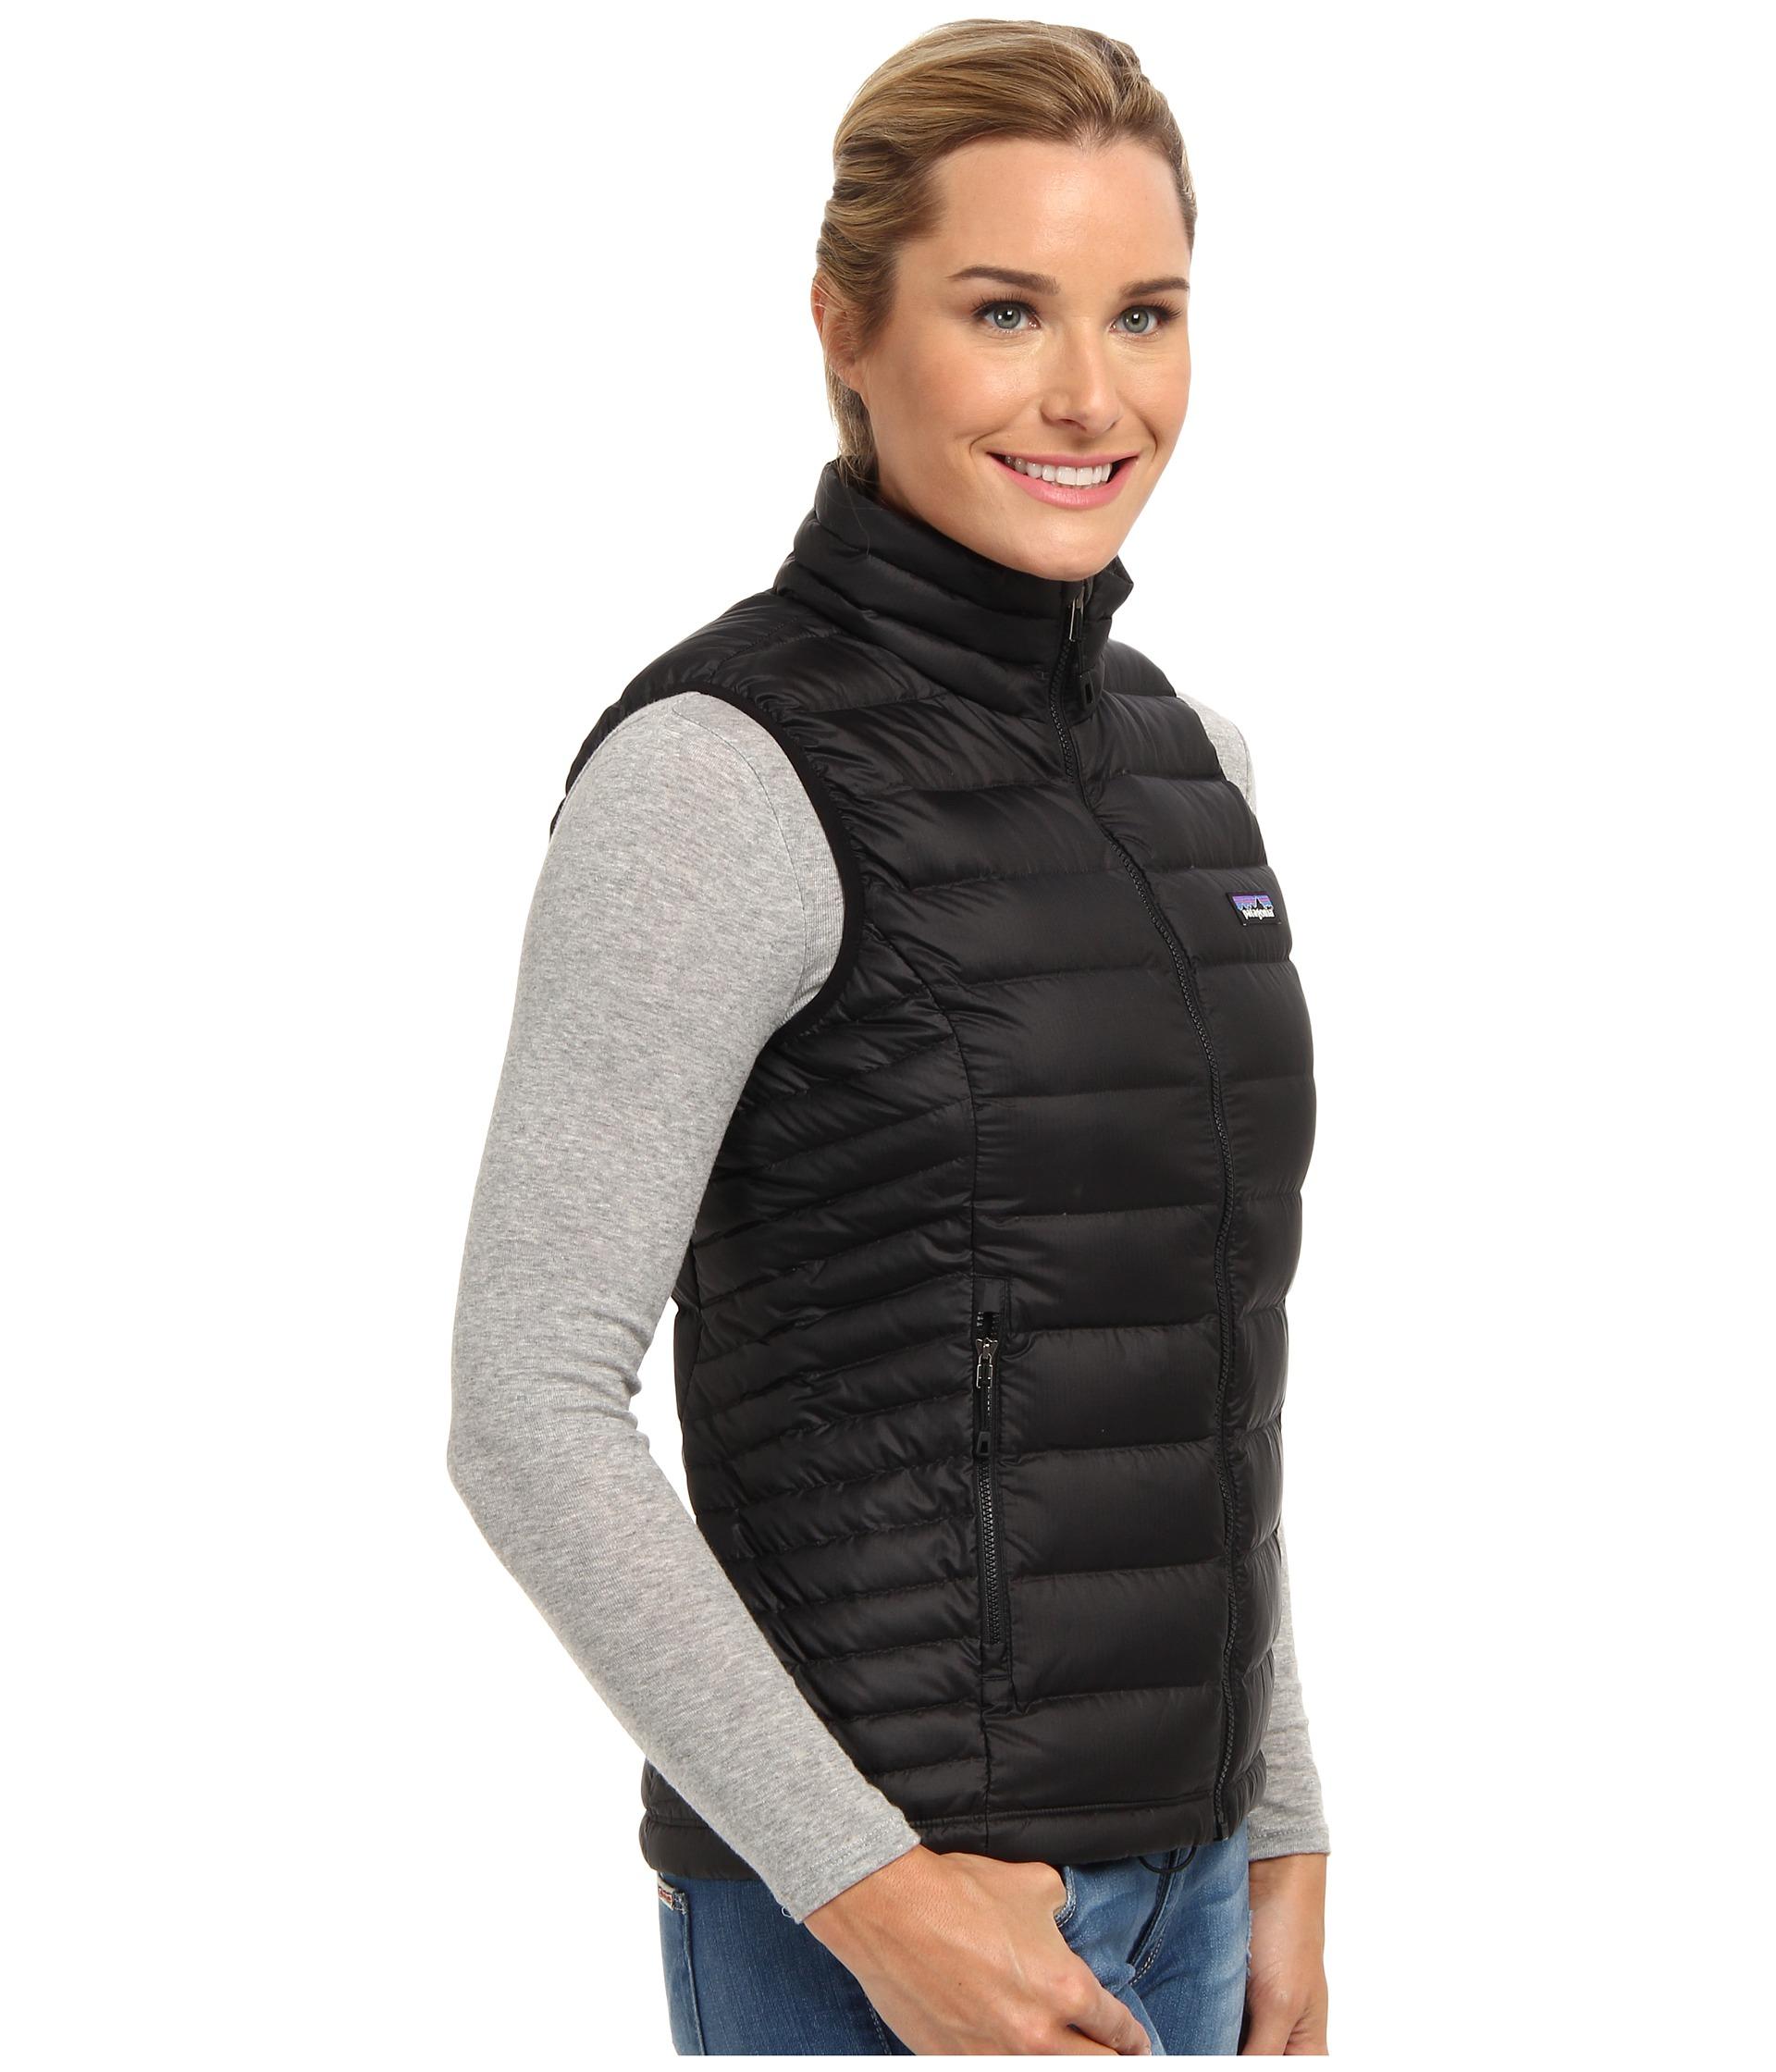 Patagonia Down Sweater Vest in Black | Lyst